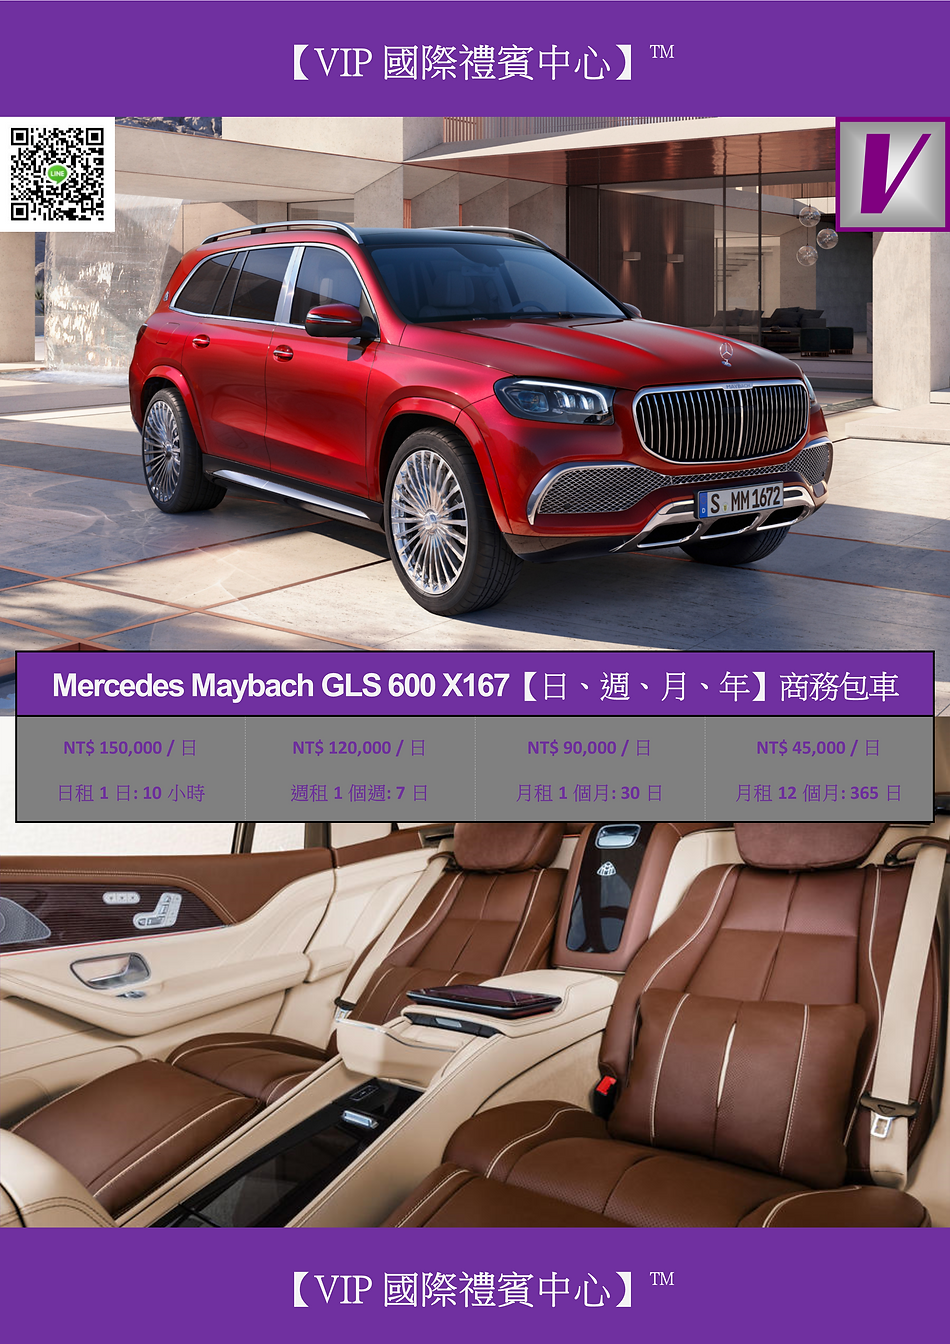 VIP國際禮賓中心 MERCEDES MAYBACH GLS 600 X167